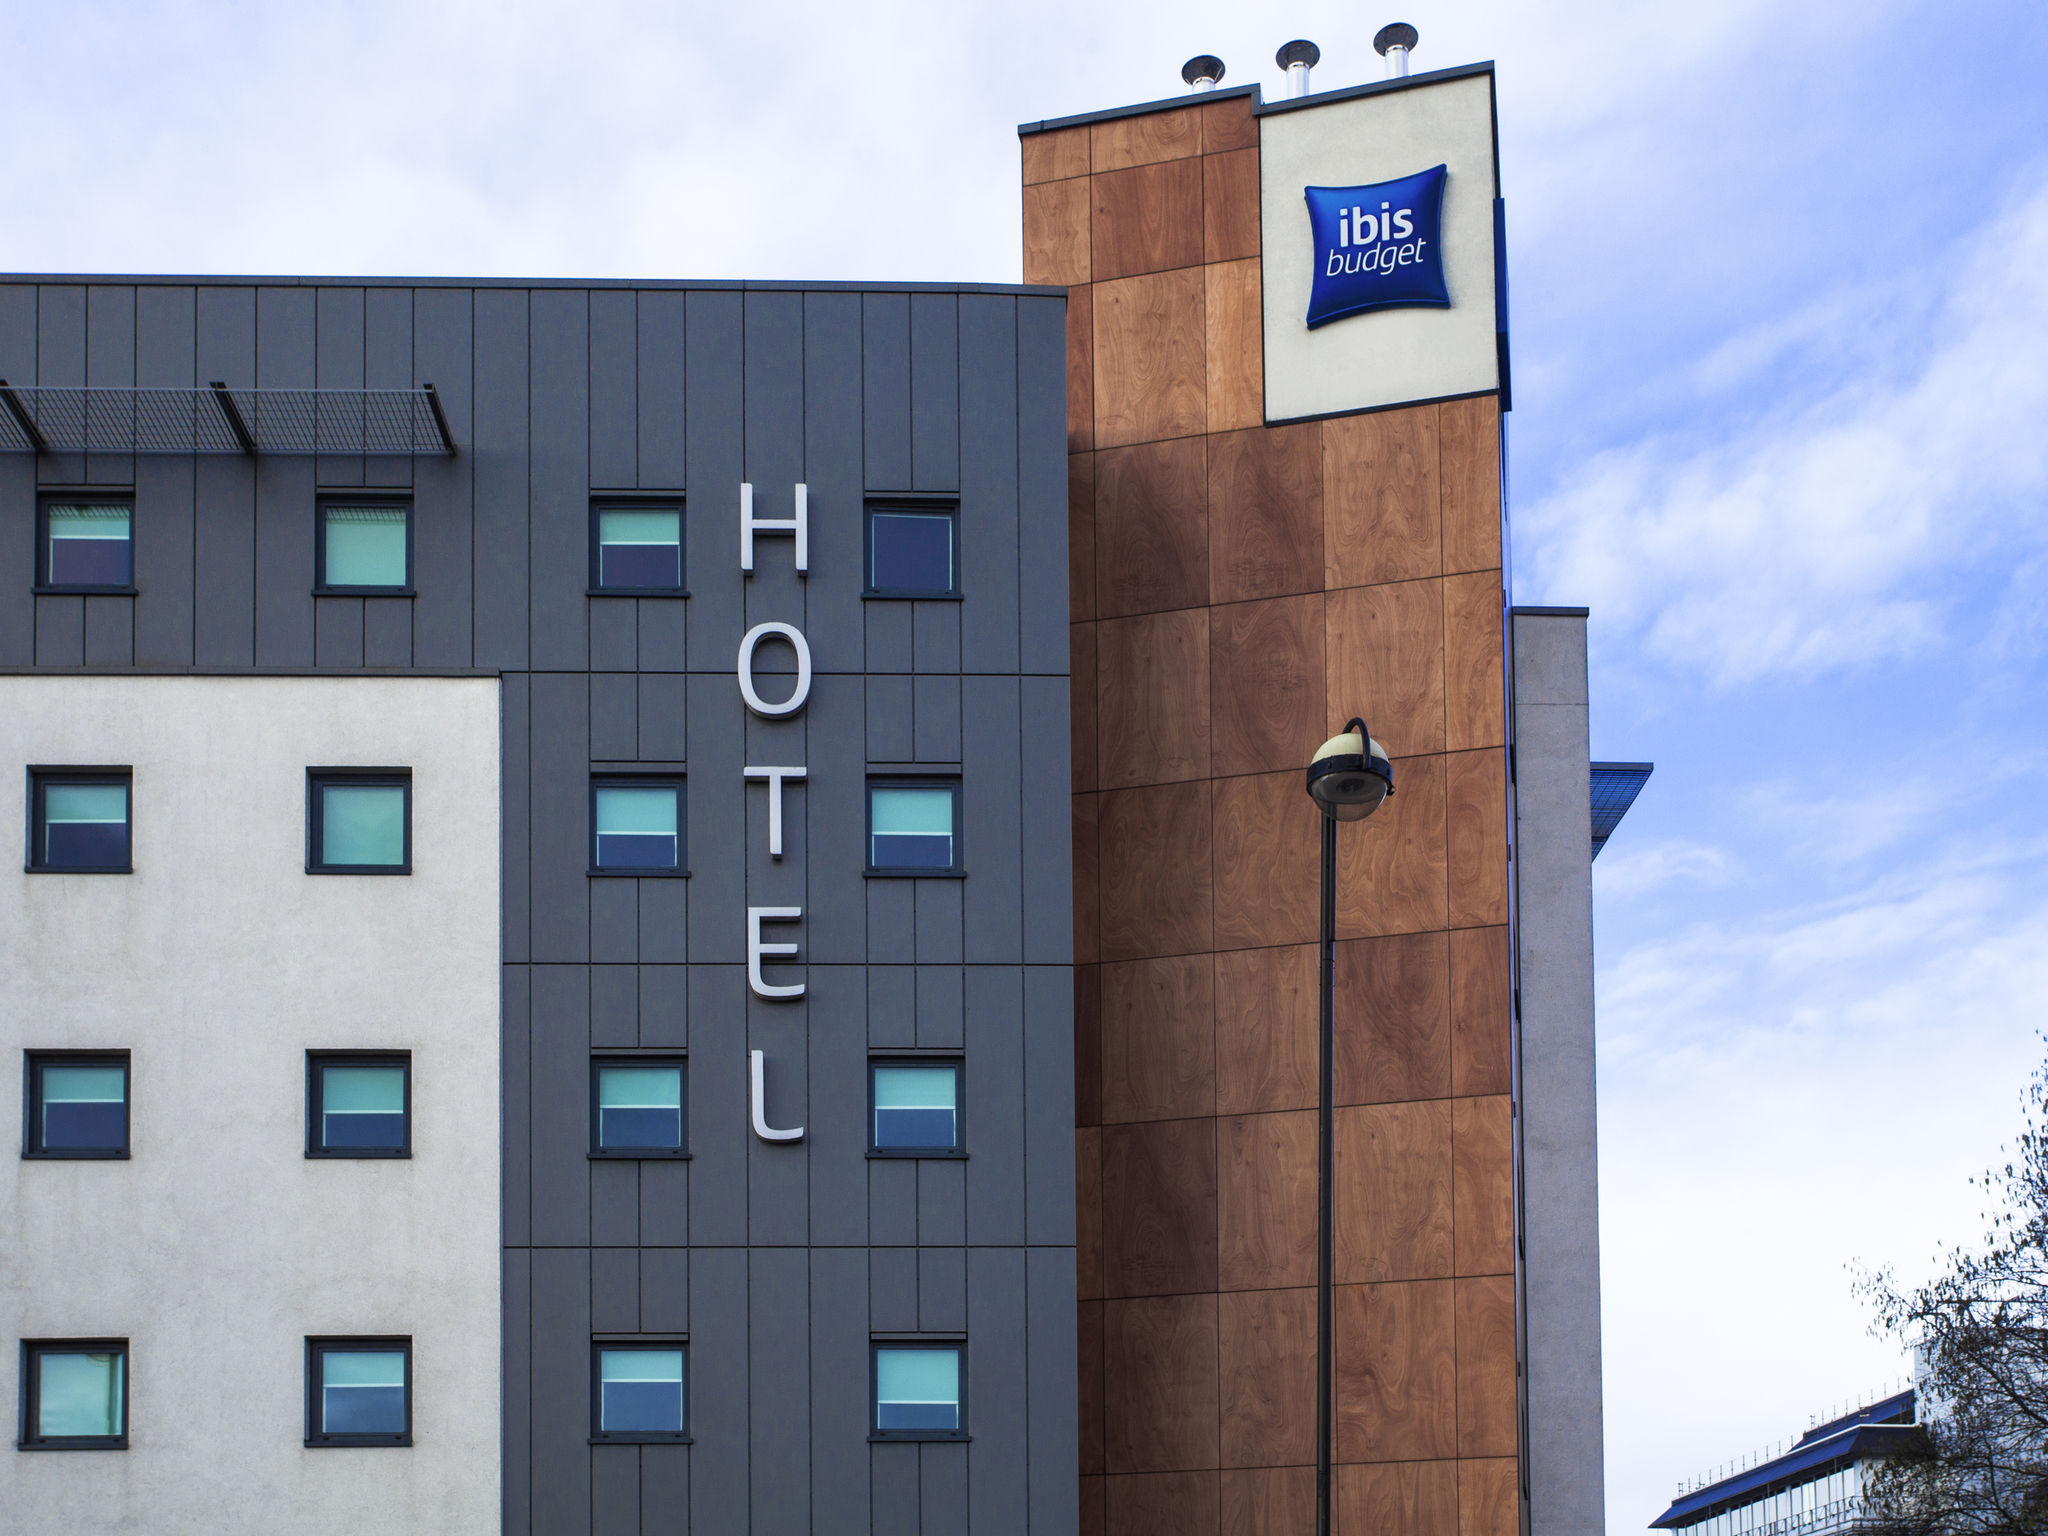 Otel – ibis budget Londra Hounslow